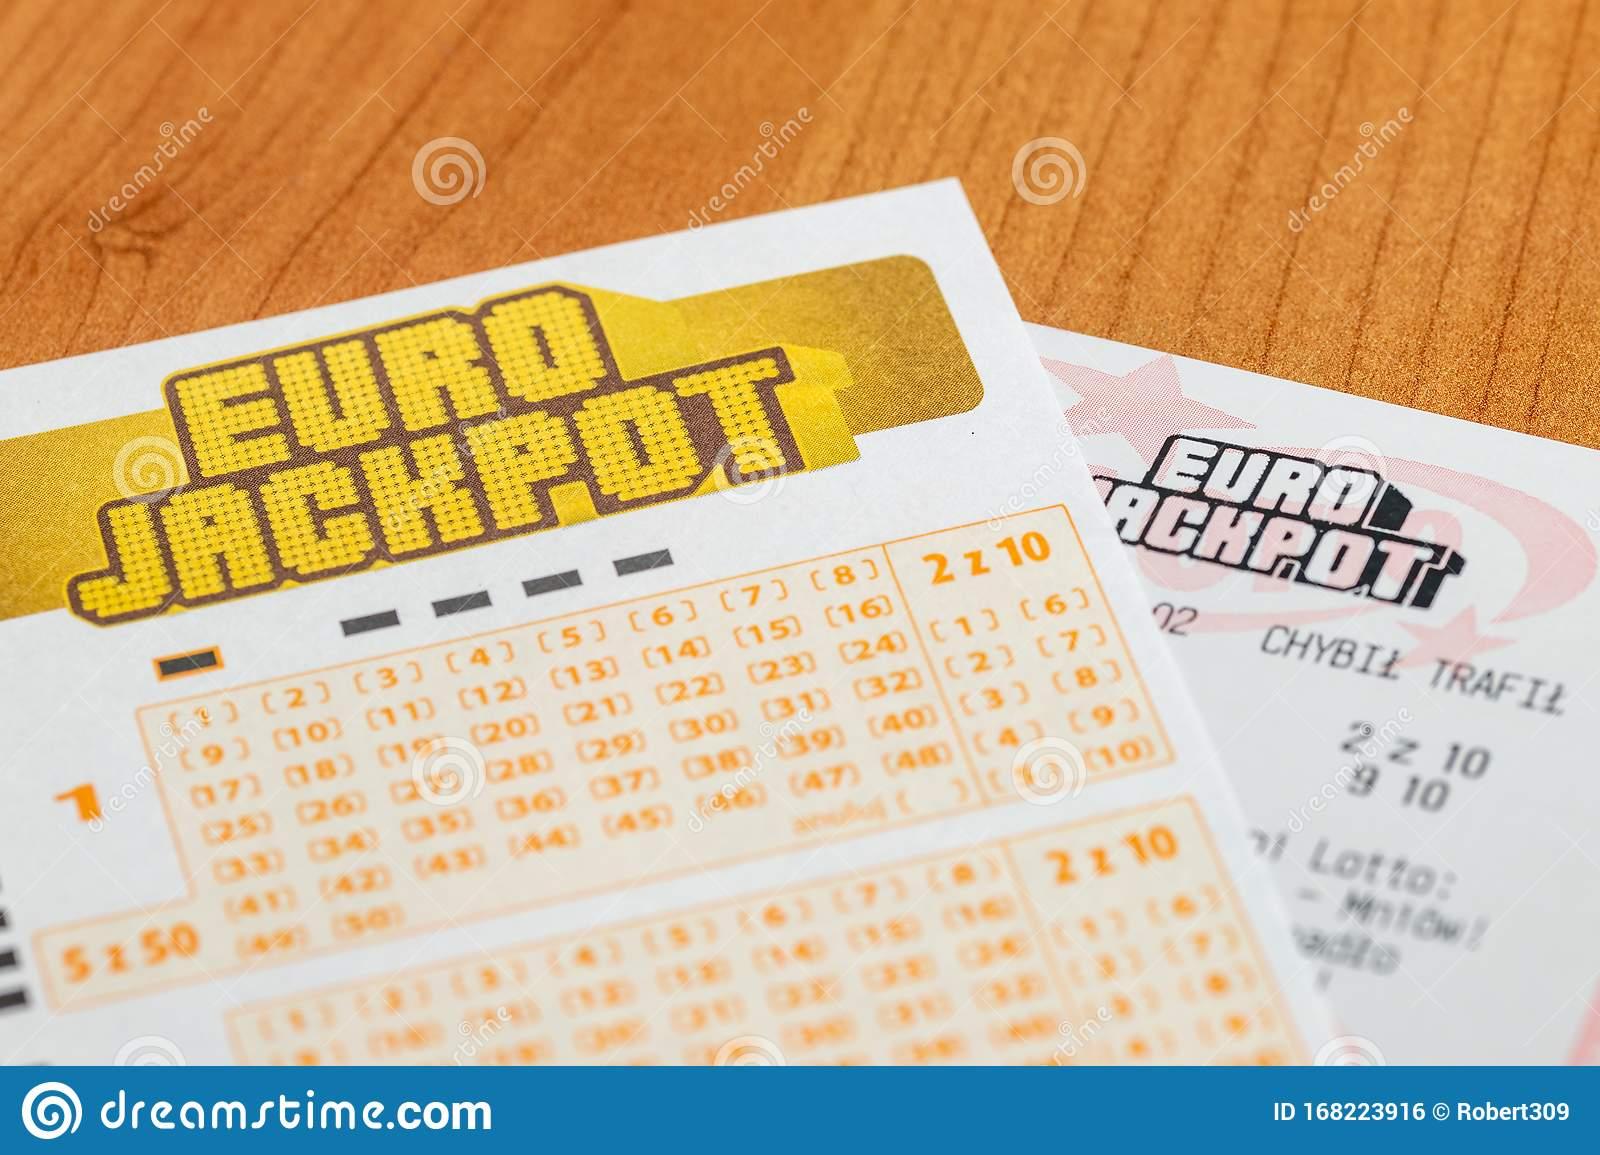 Play poland lotto online - polish lotto tickets | multilotto